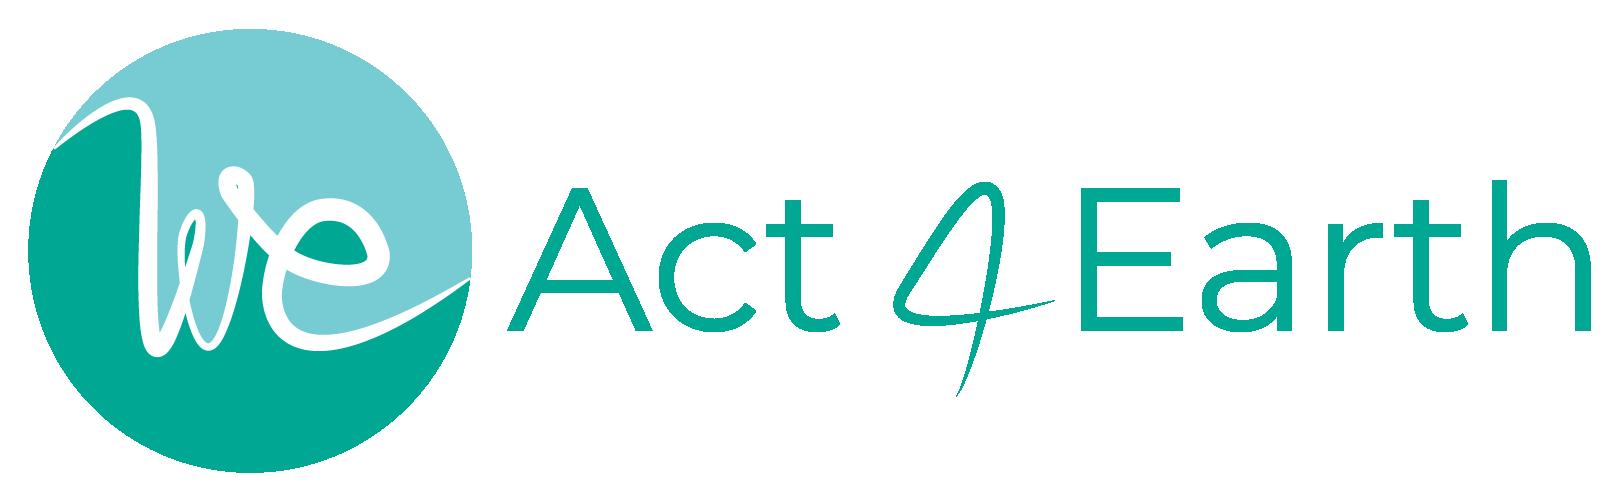 Logo de WeAct4Eart client de Lakaa